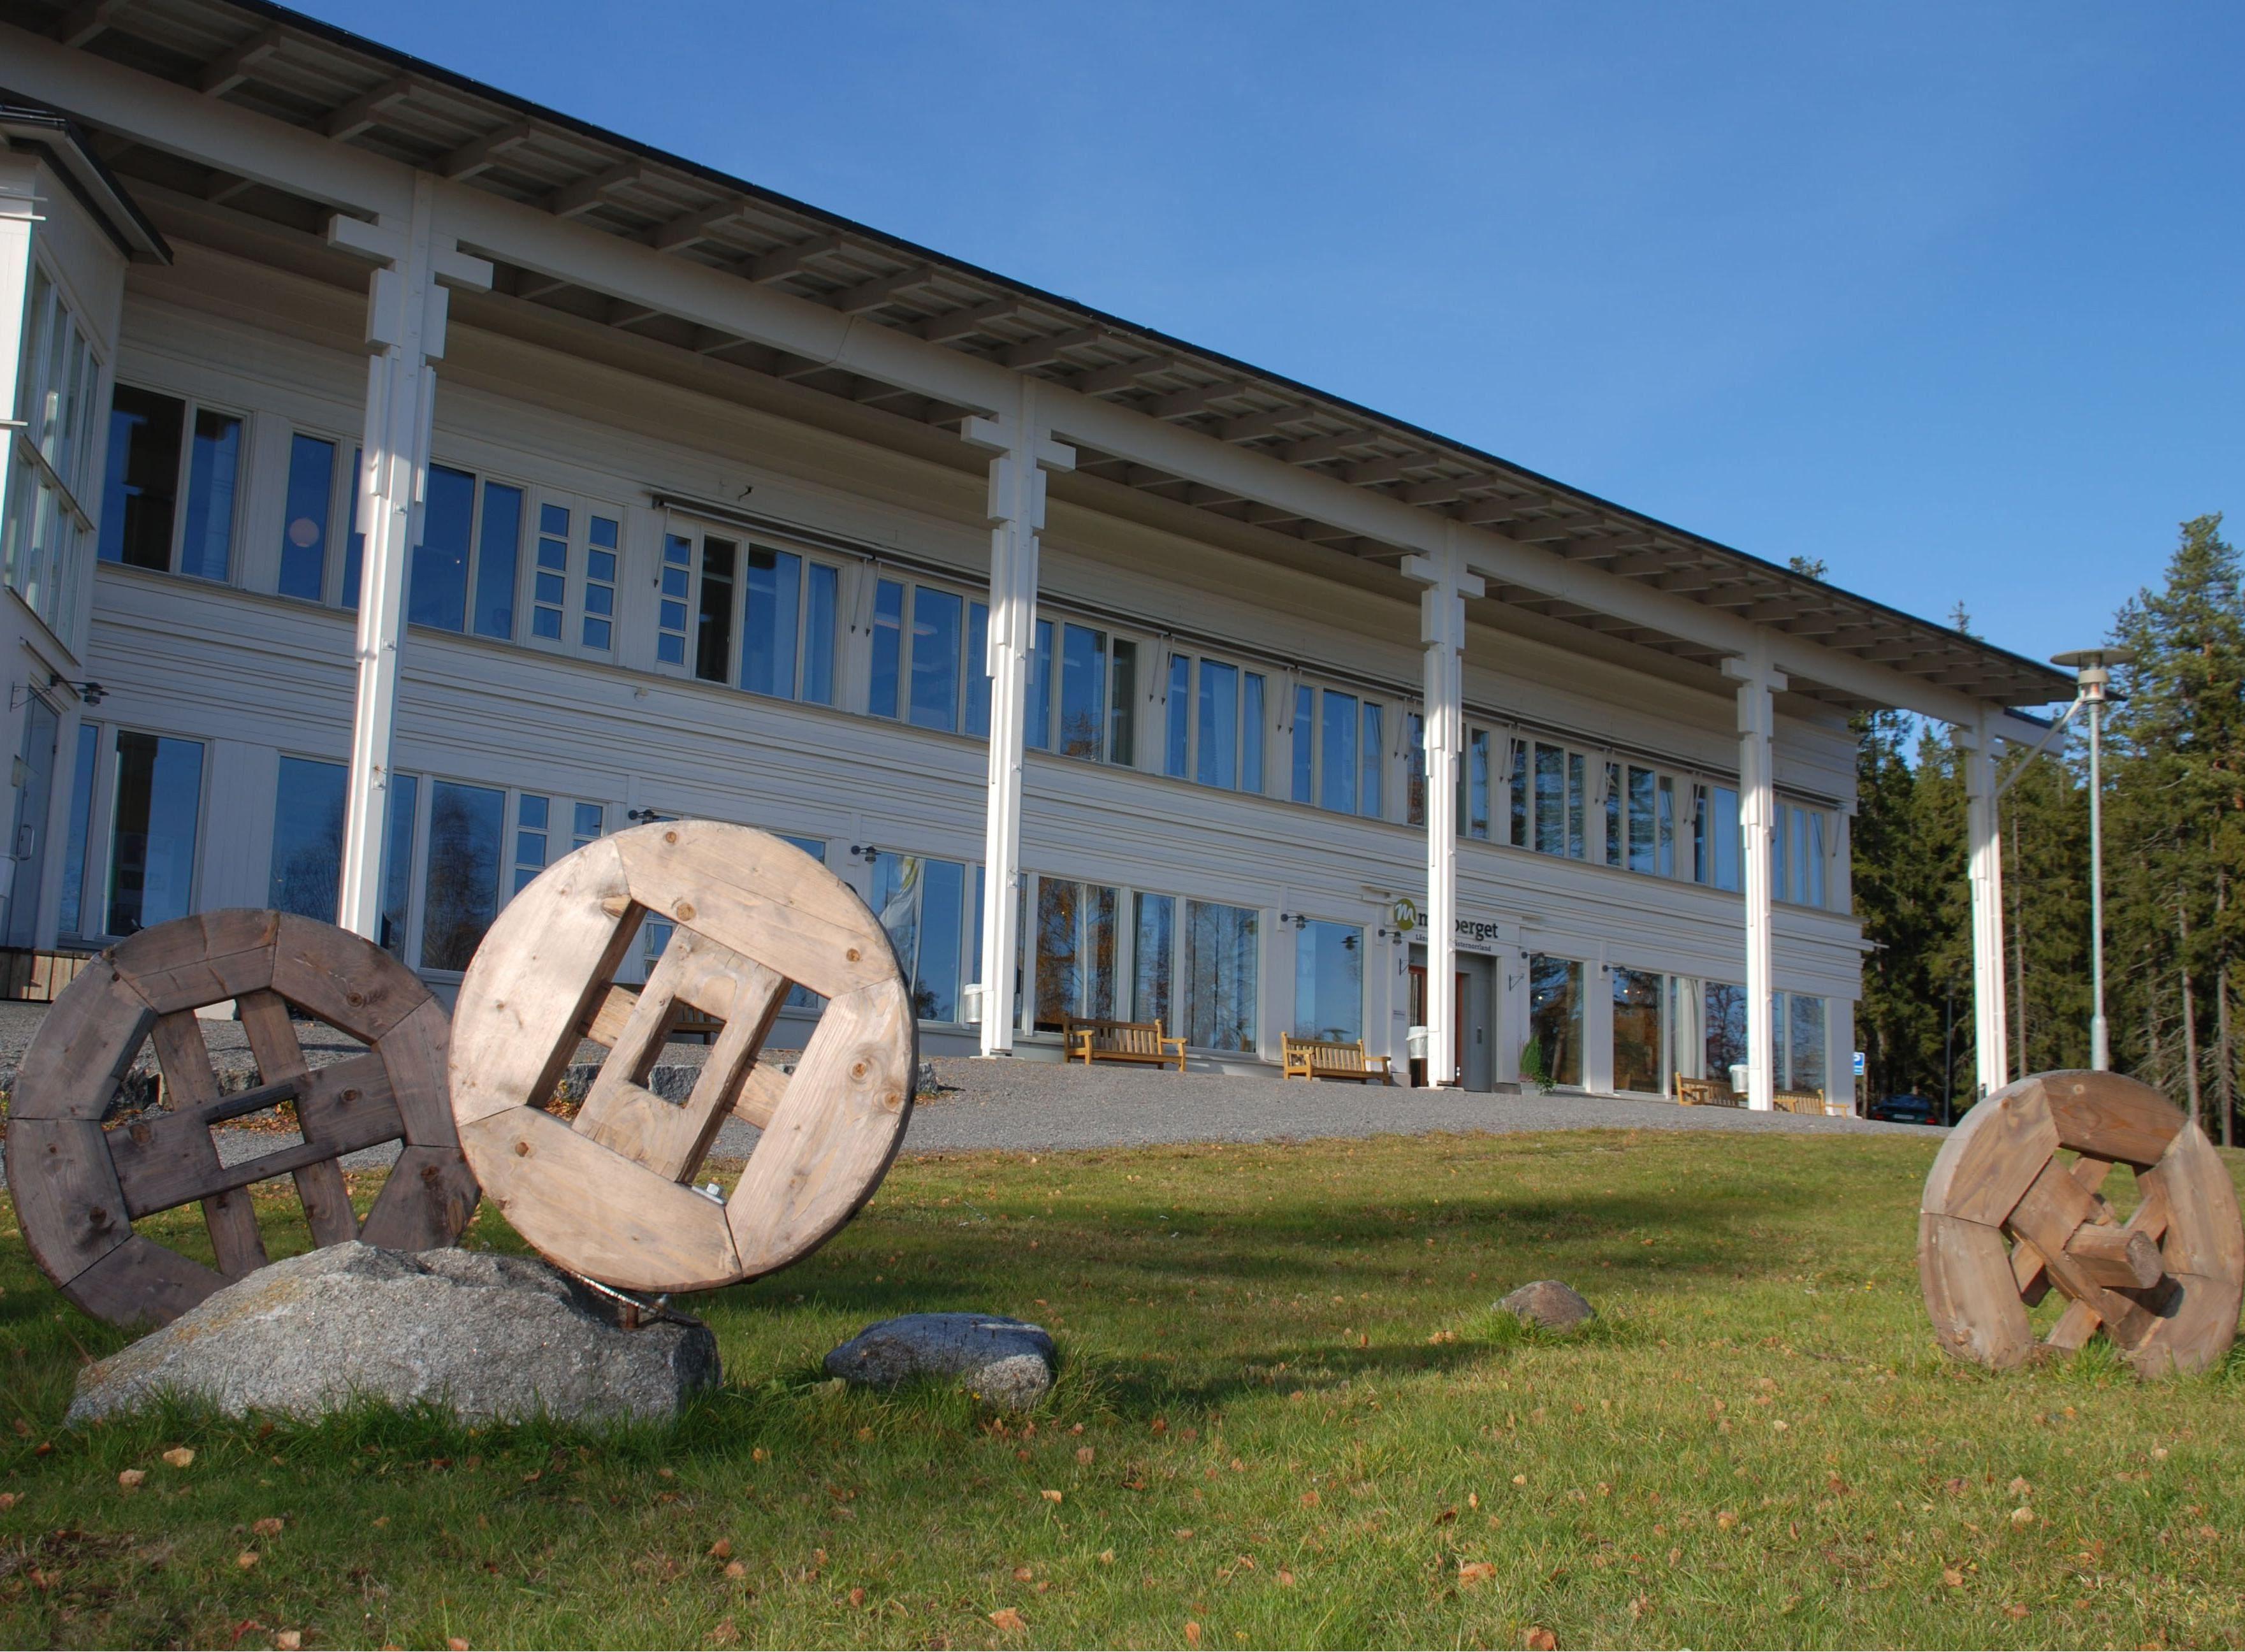 Murberget Länsmuseet Västernorrland